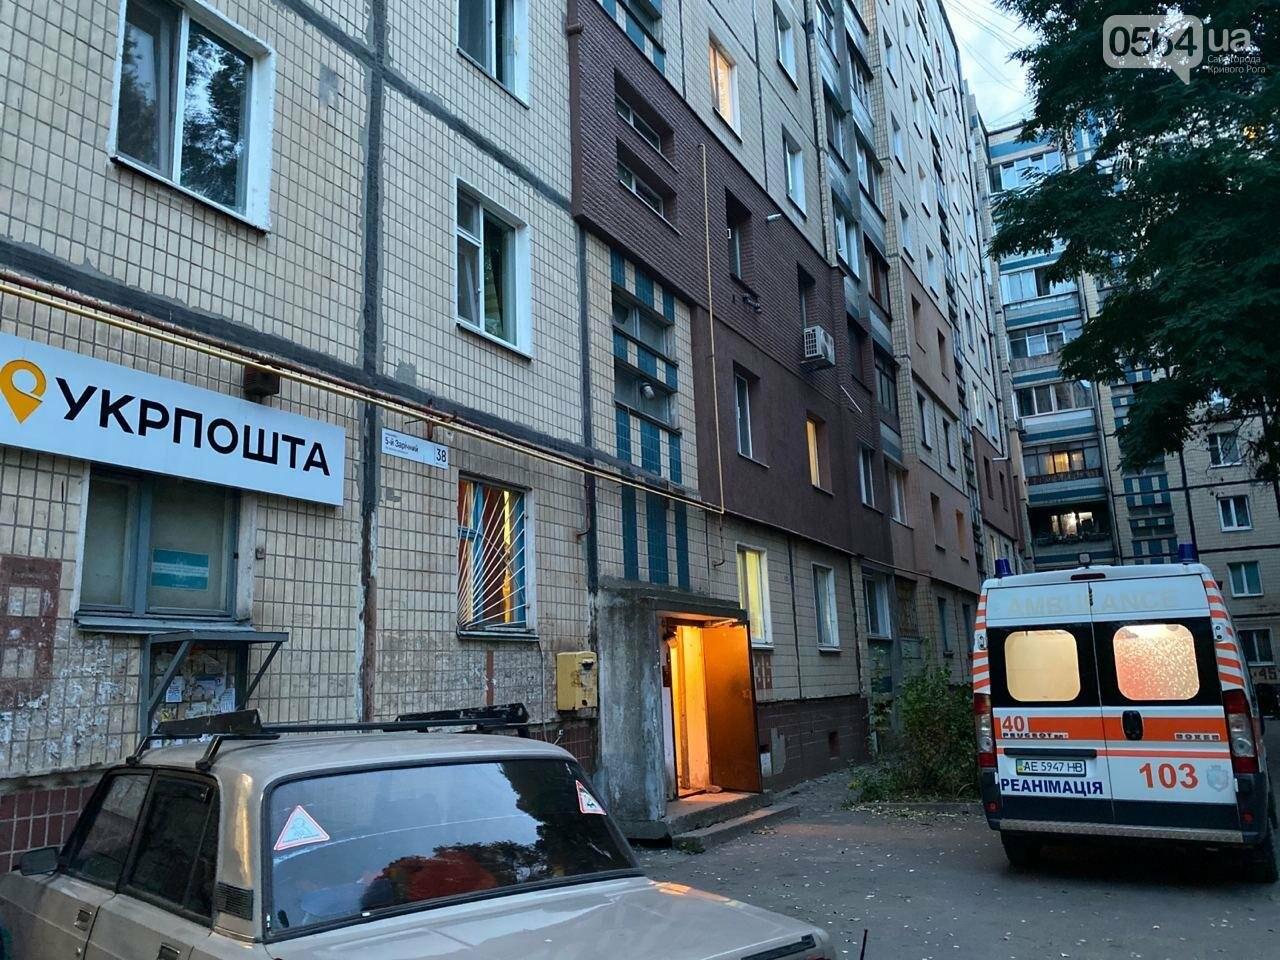 В Кривом Роге погиб мужчина, упавший с 5 этажа жилого дома, - ФОТО 18+, фото-7